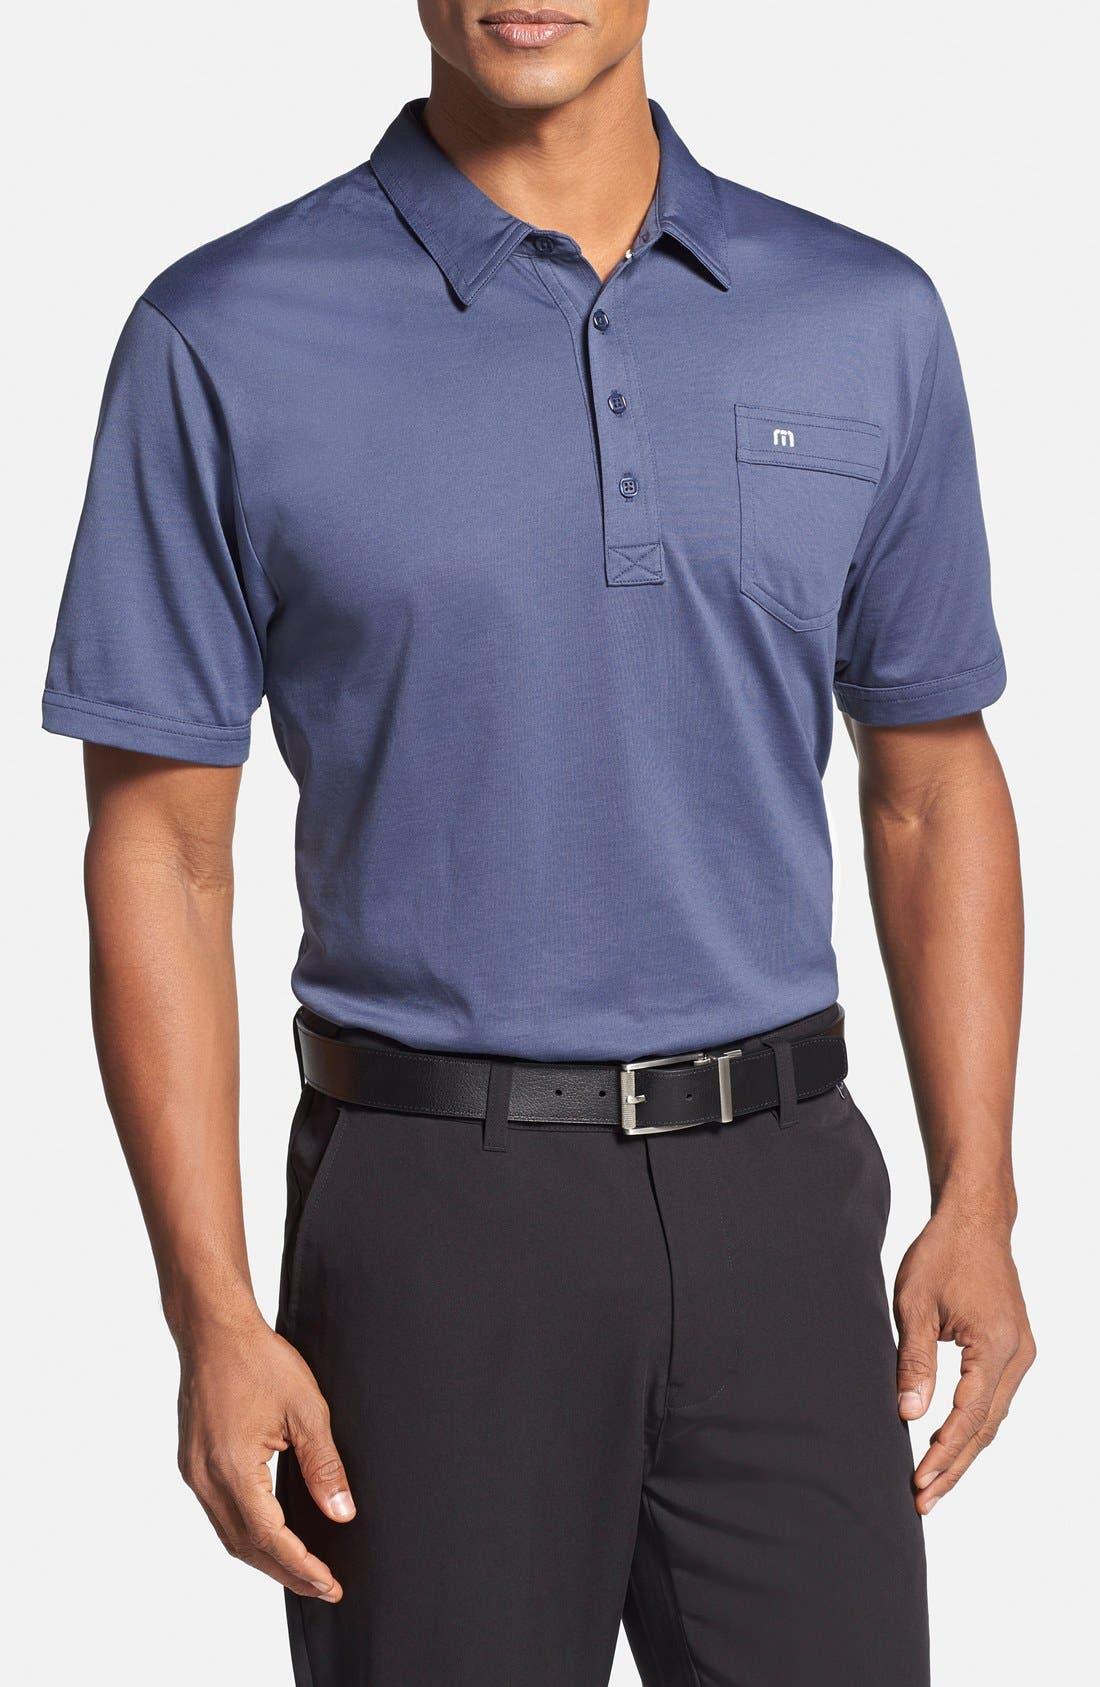 Main Image - Travis Mathew 'OG' Trim Fit Performance Golf Polo